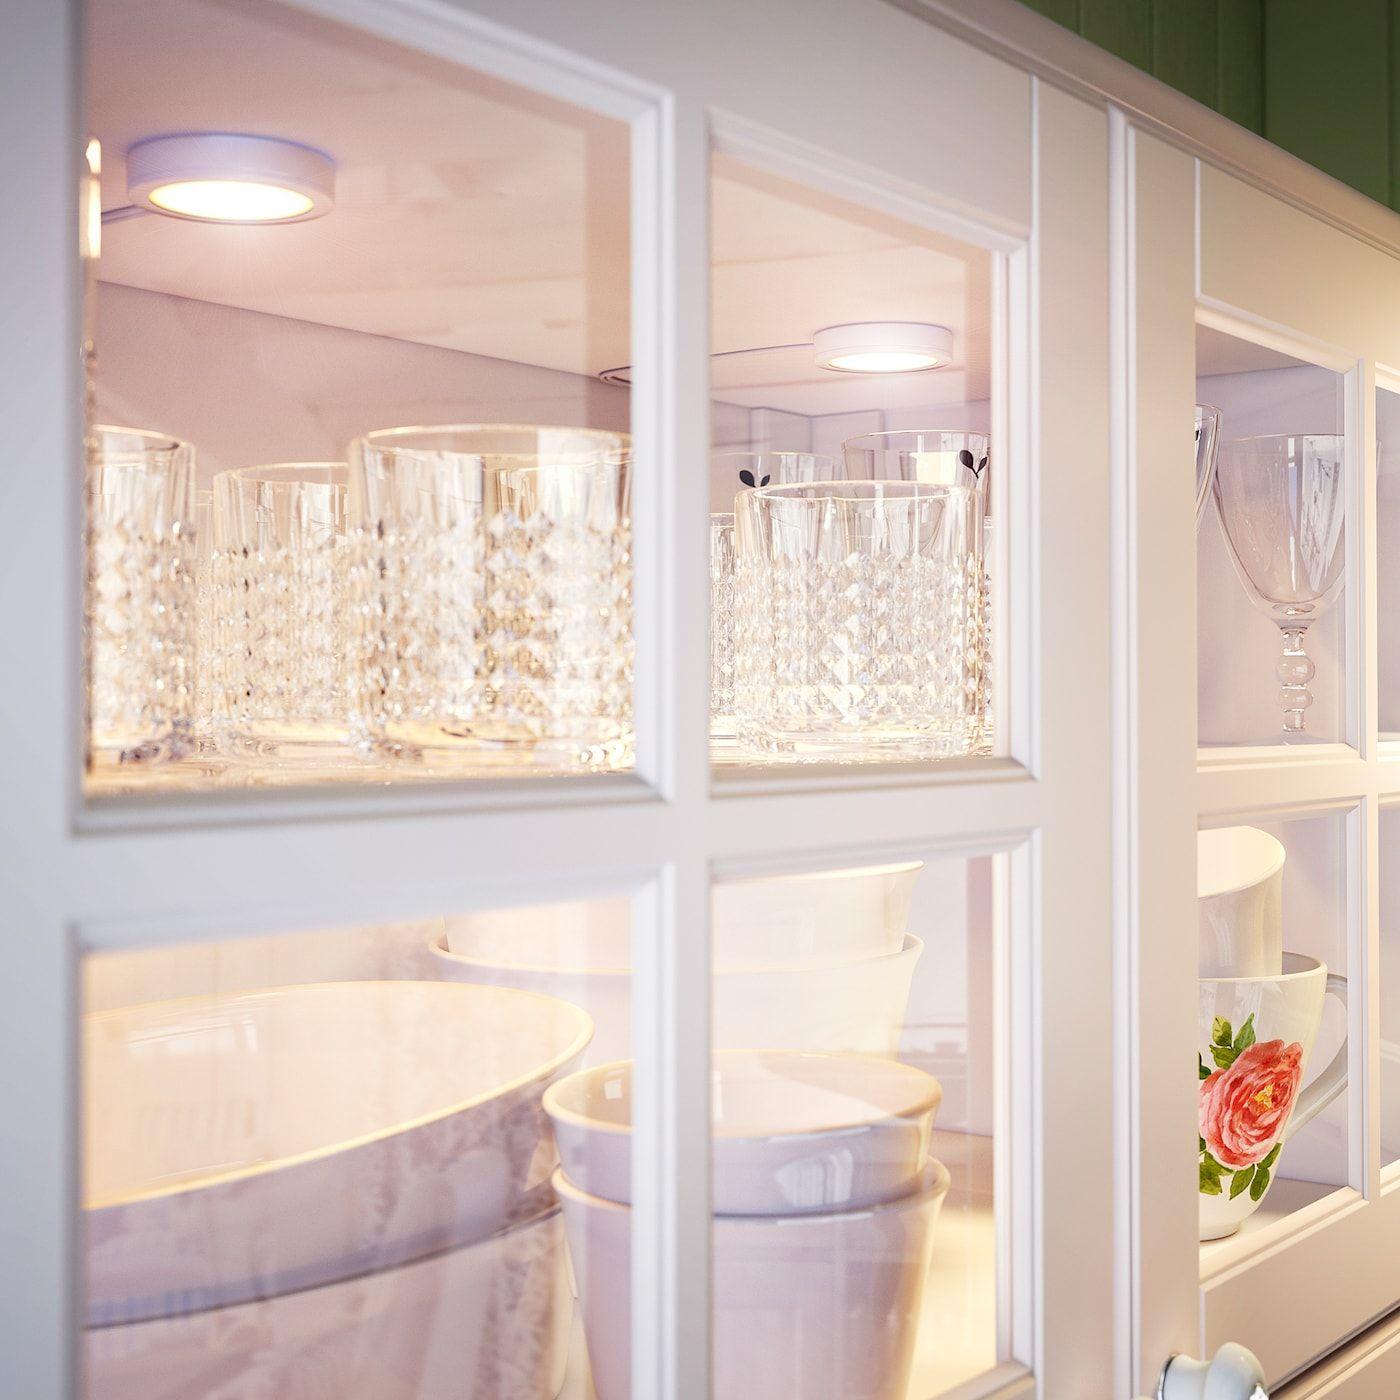 IKEA OMLOPP LED spotlight white in 2020 Ikea, Bookcase